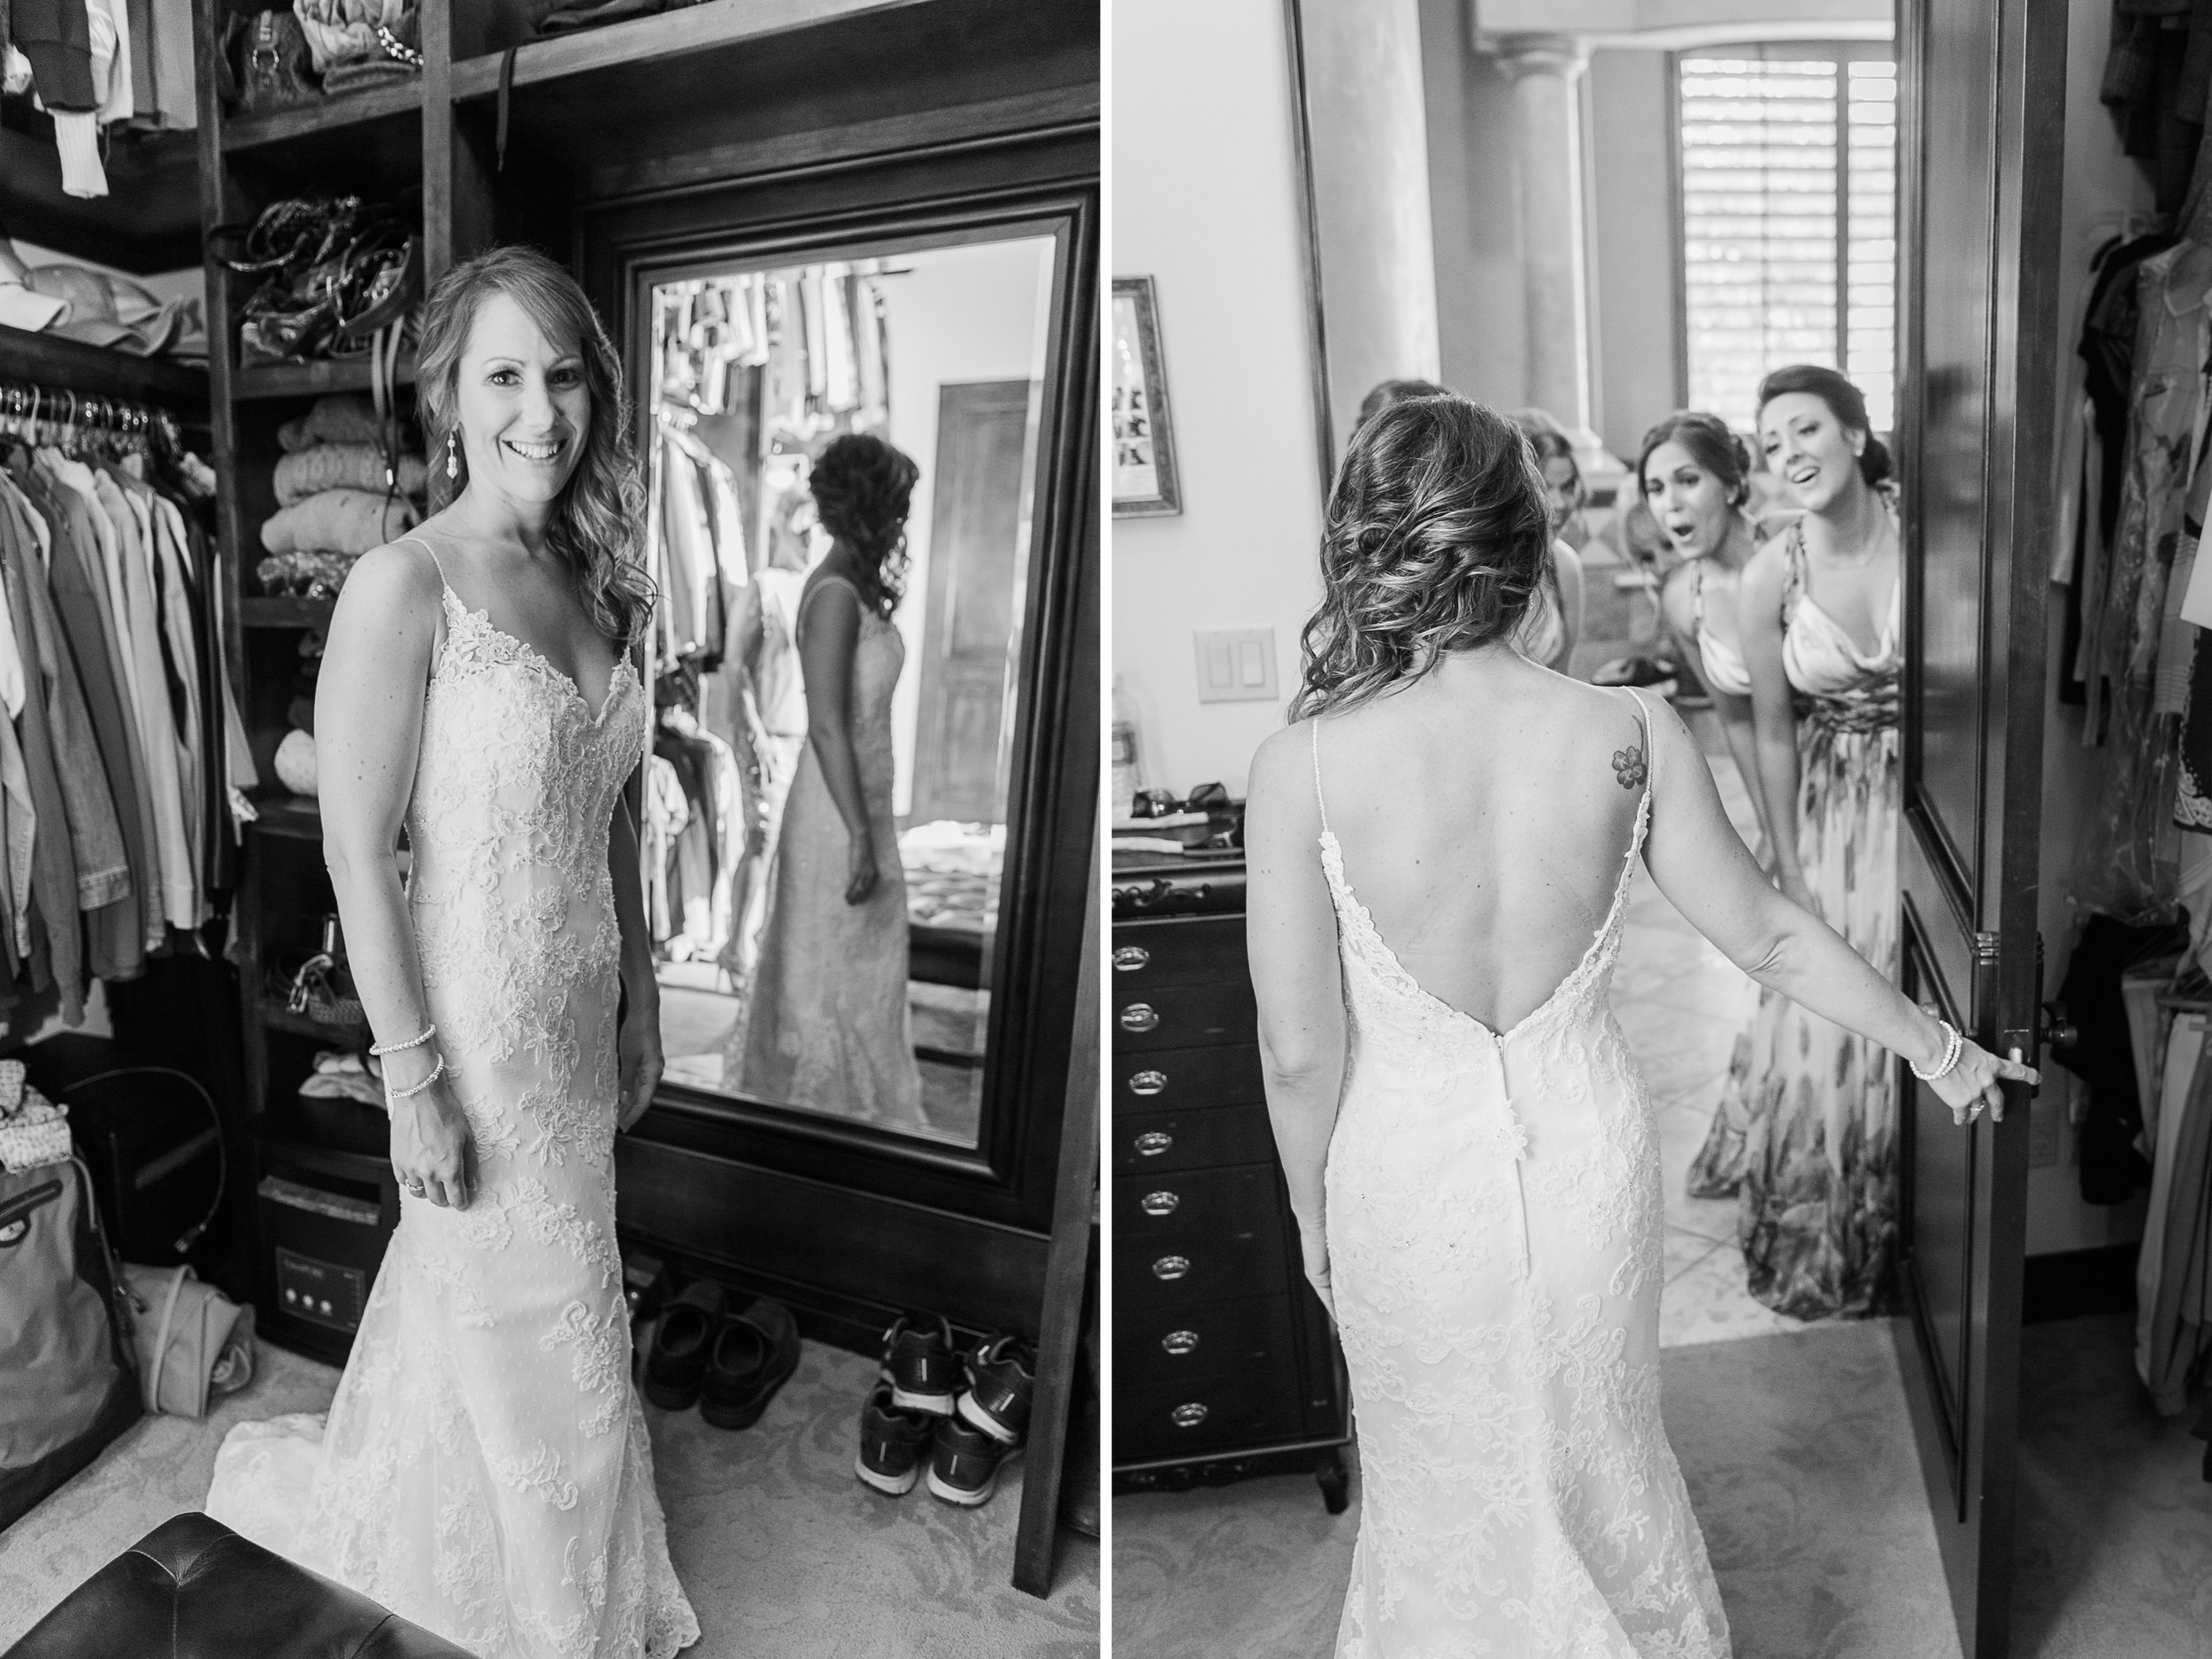 braswell wedding blog-05.jpg